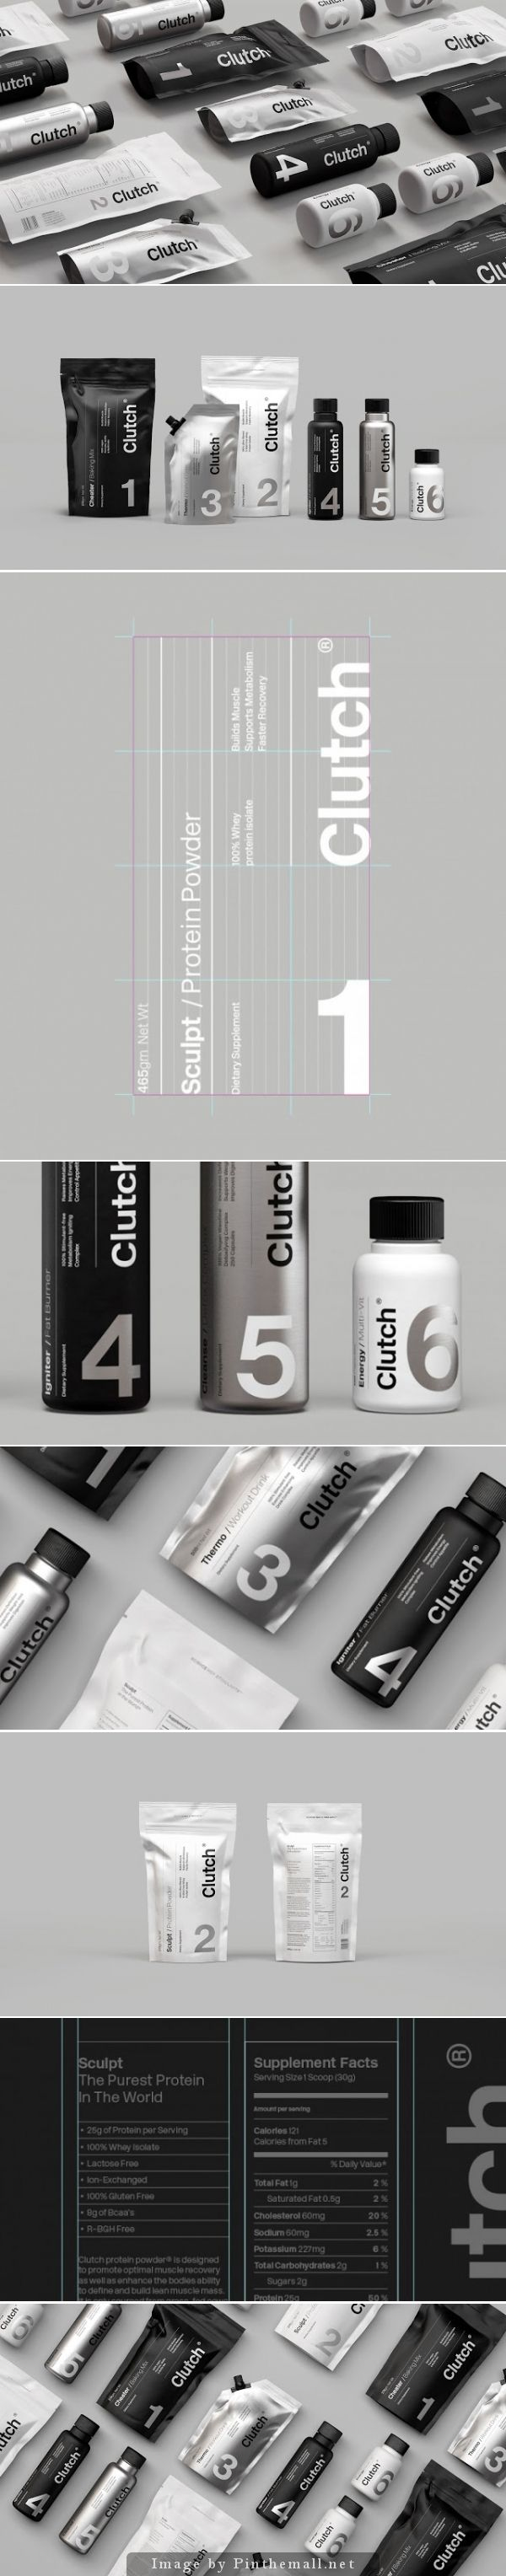 Clutch Bodyshop, Creative Agency: Socio Design